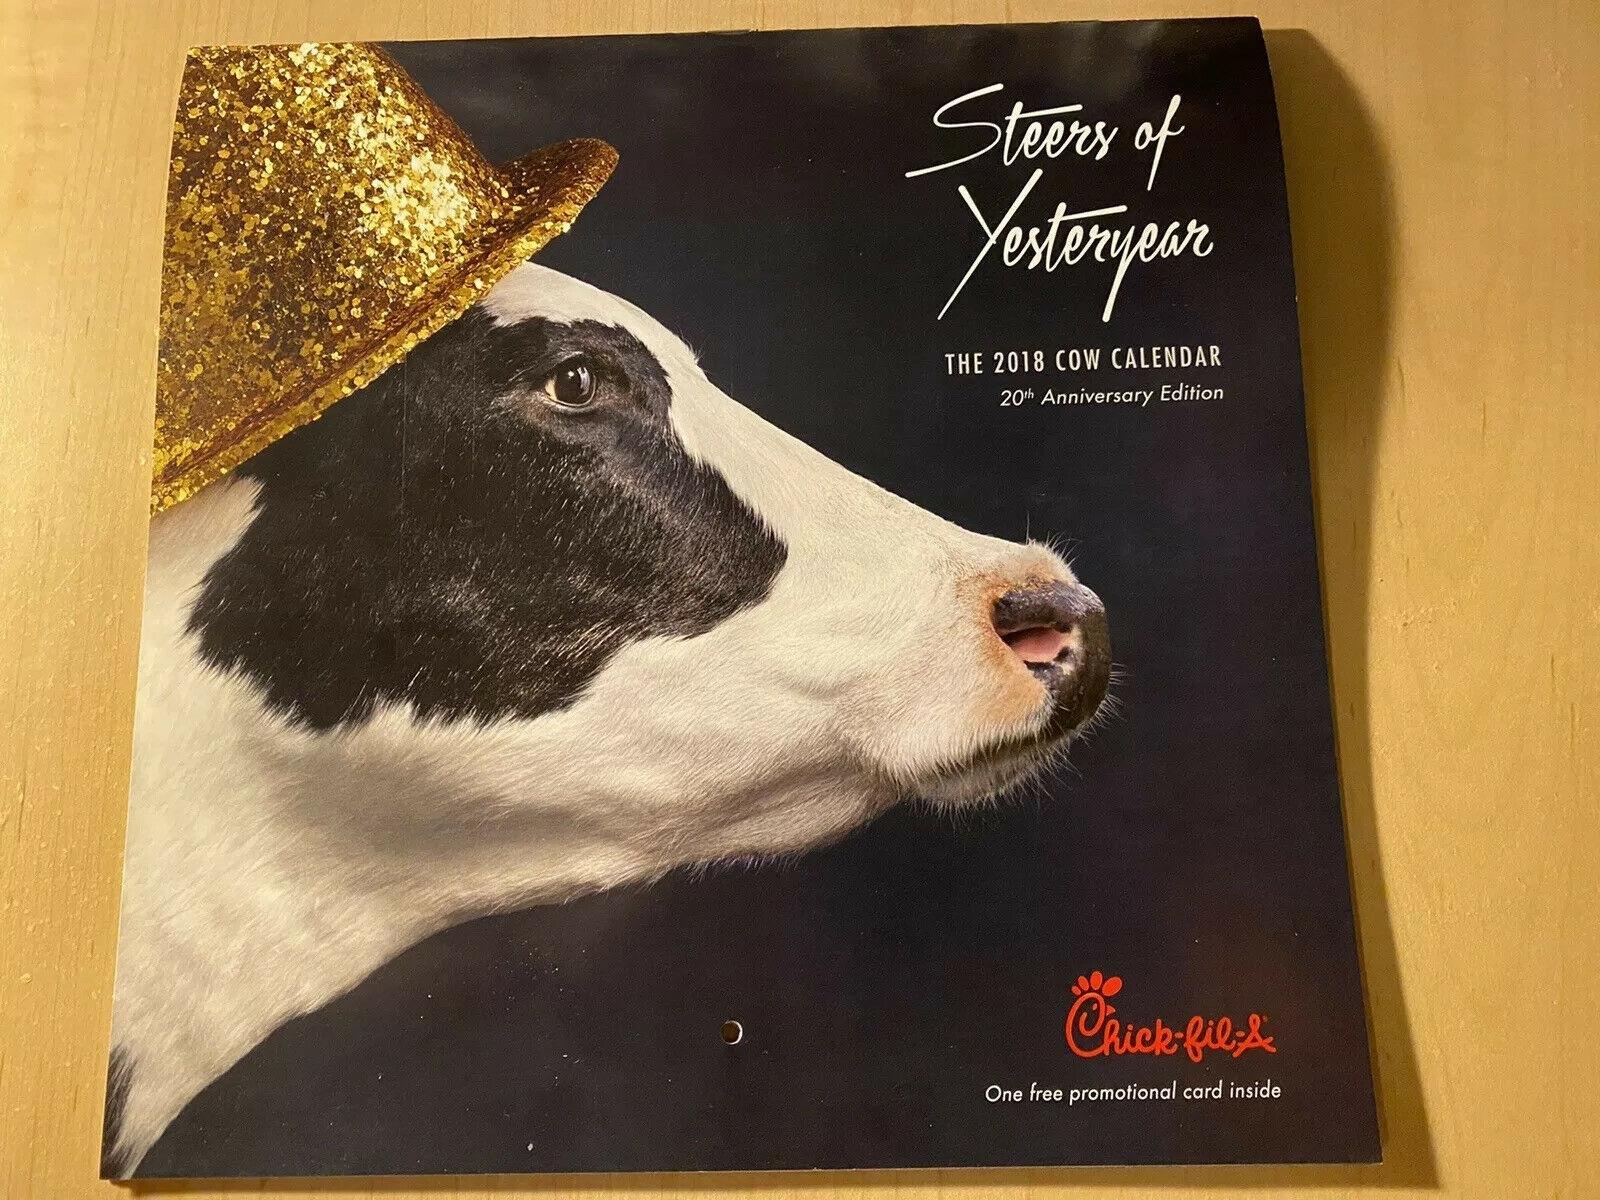 2018 Chick-Fil-A Cow Calendar Card regarding Cow Calendar Chick Fil A